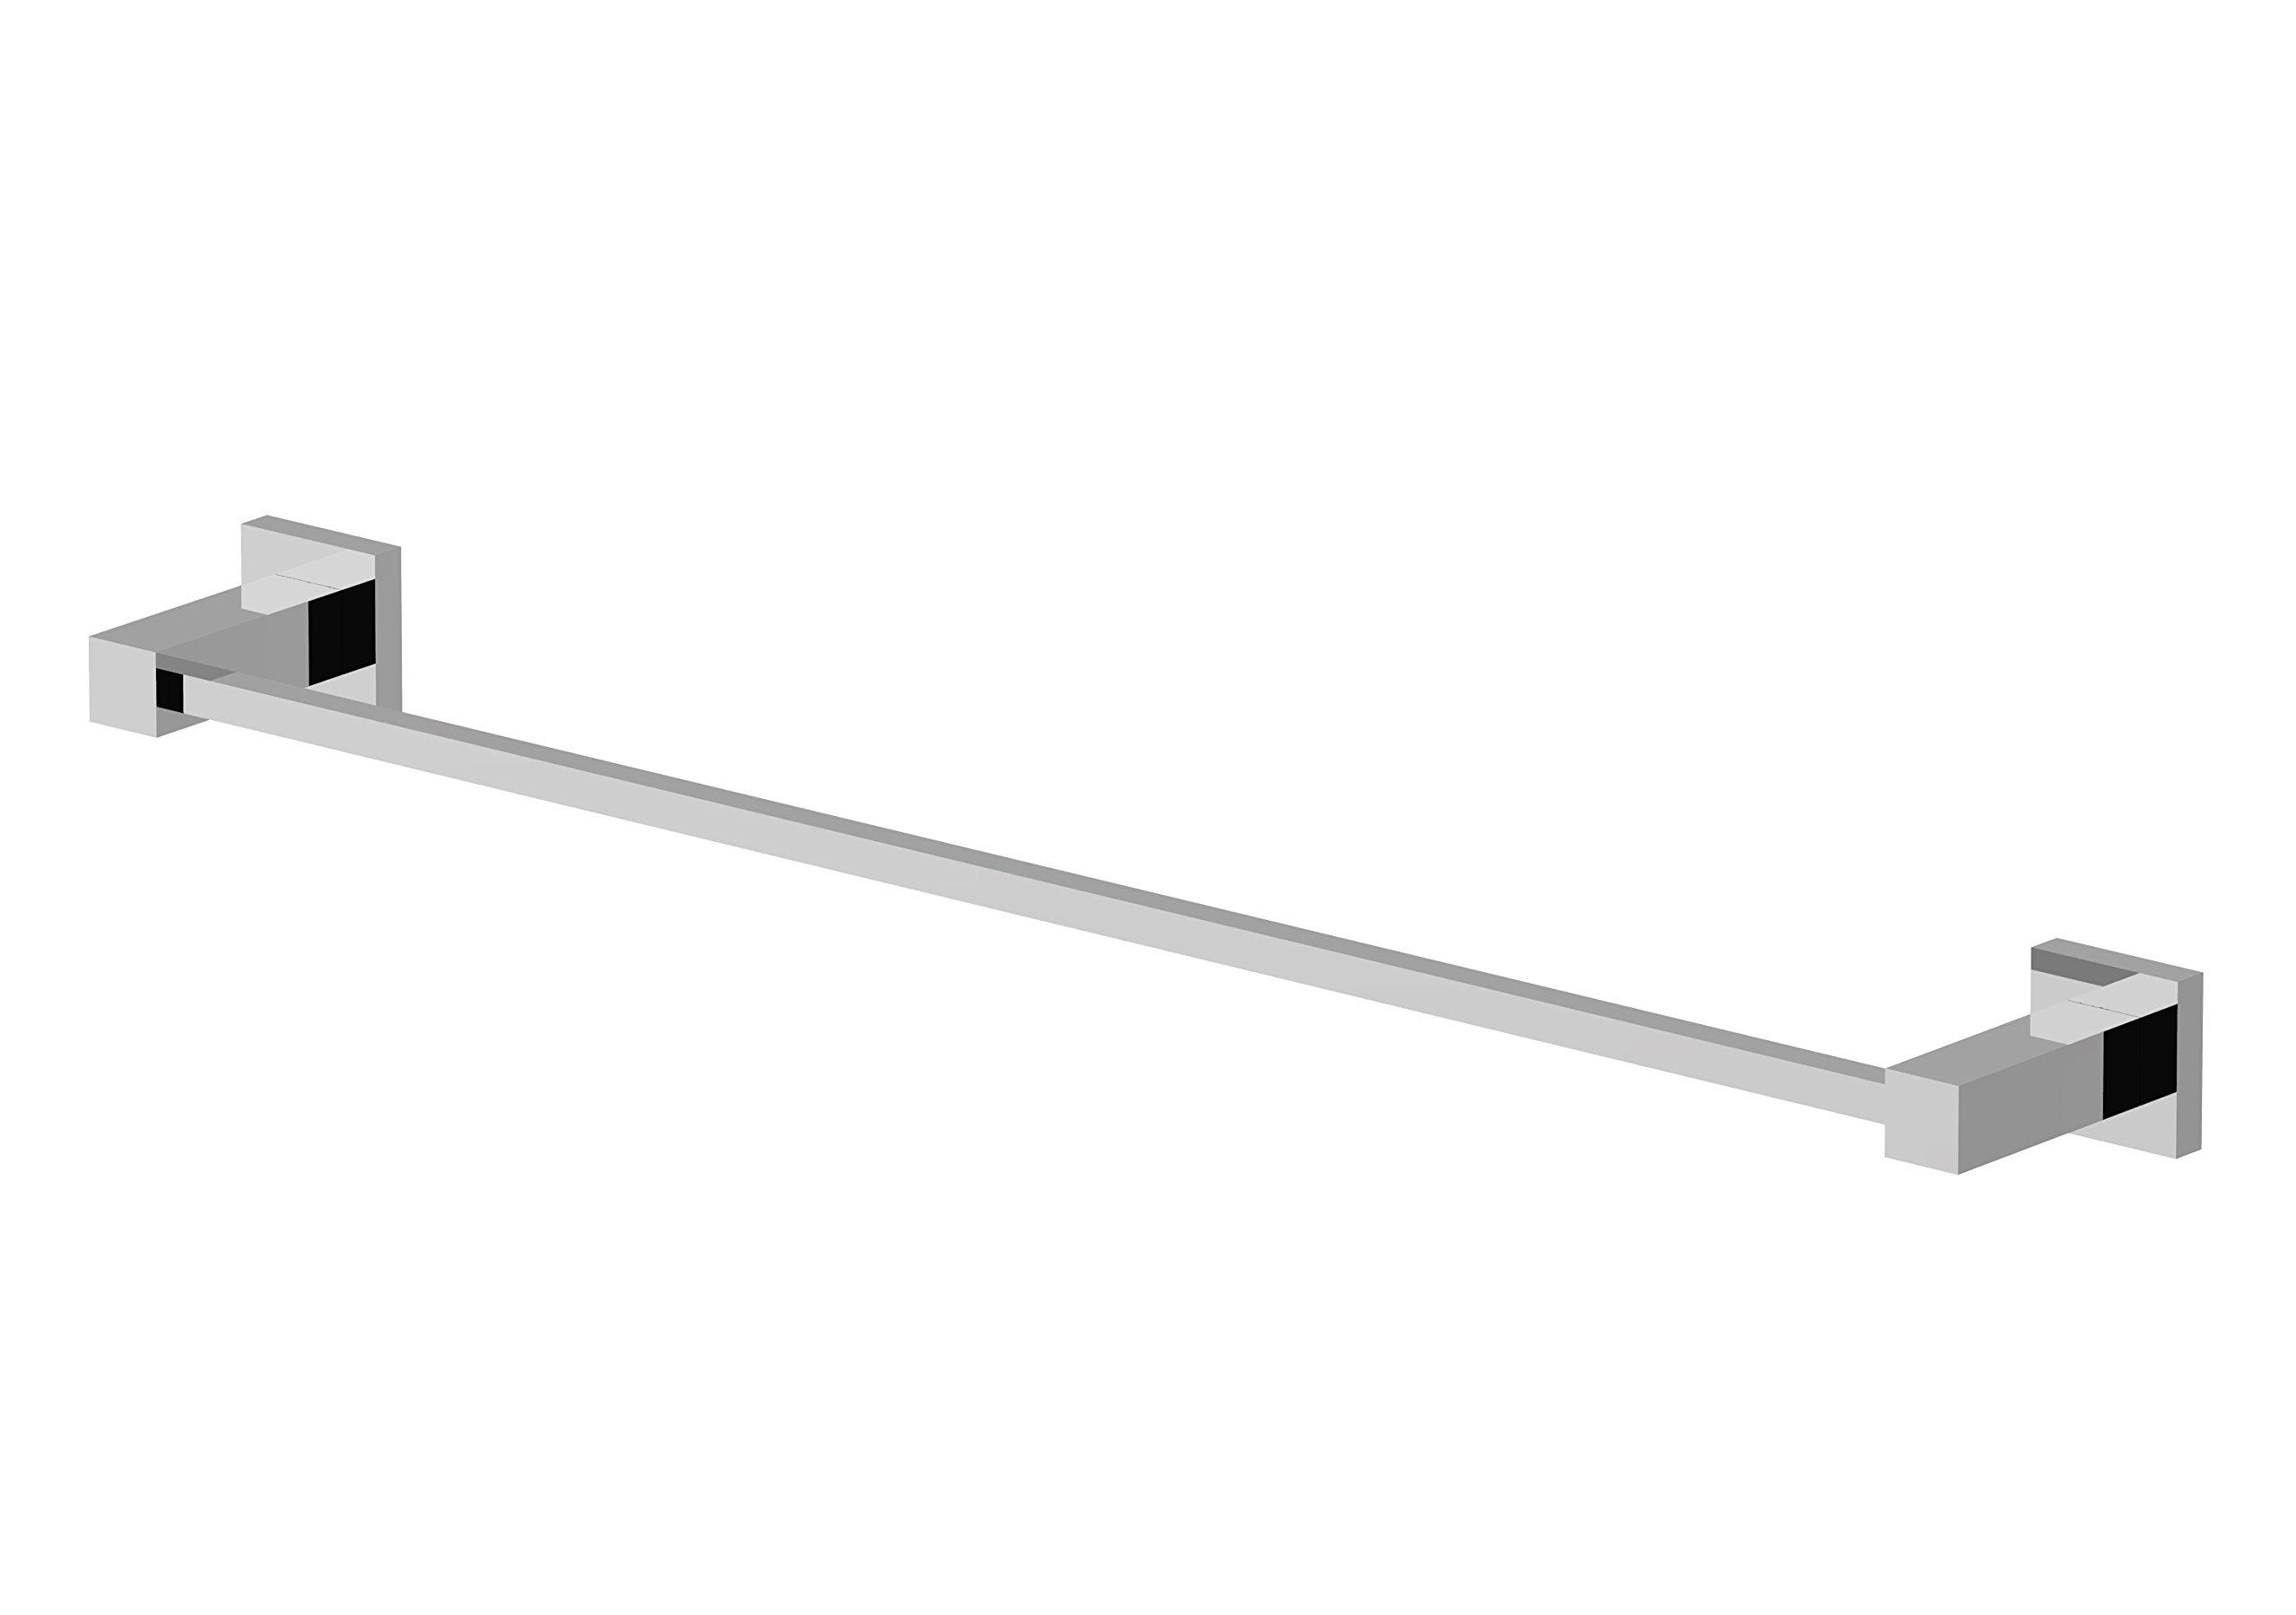 Eviva EVAC20CH Toweller Towel bar Bathroom Accessories Combination, Chrome